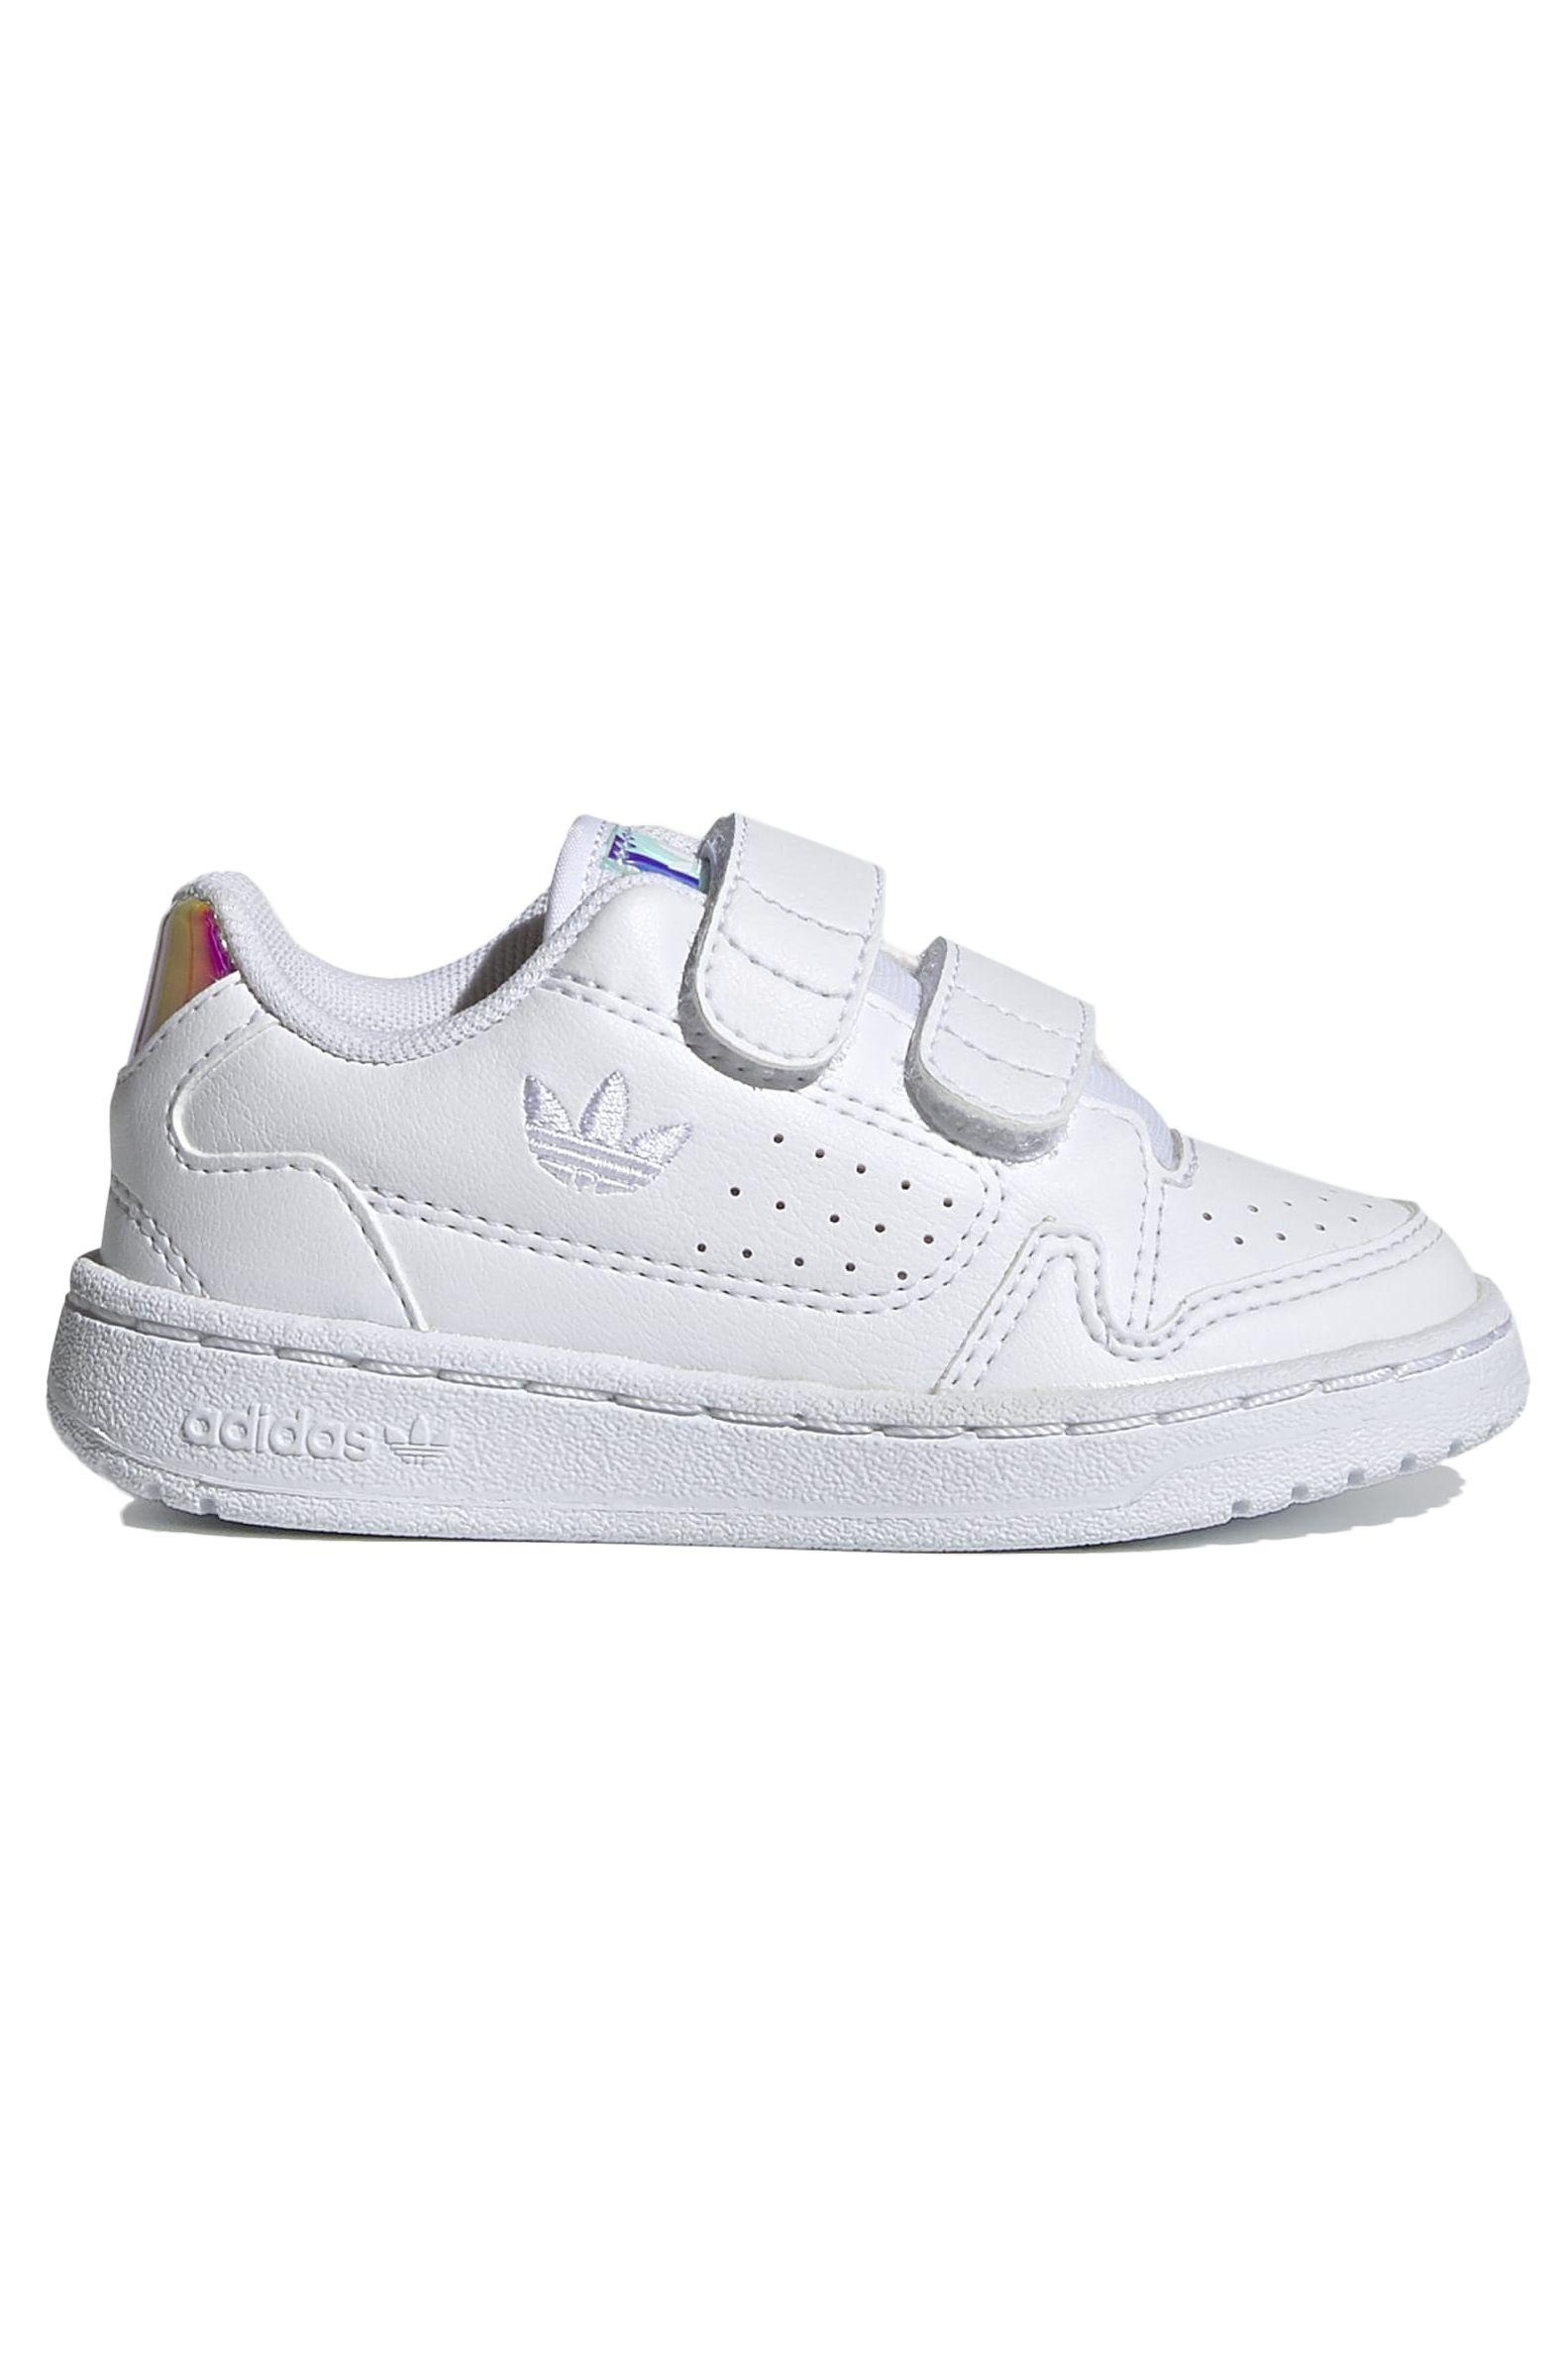 Adidas Shoes NY 90 CF I Ftwrwhite